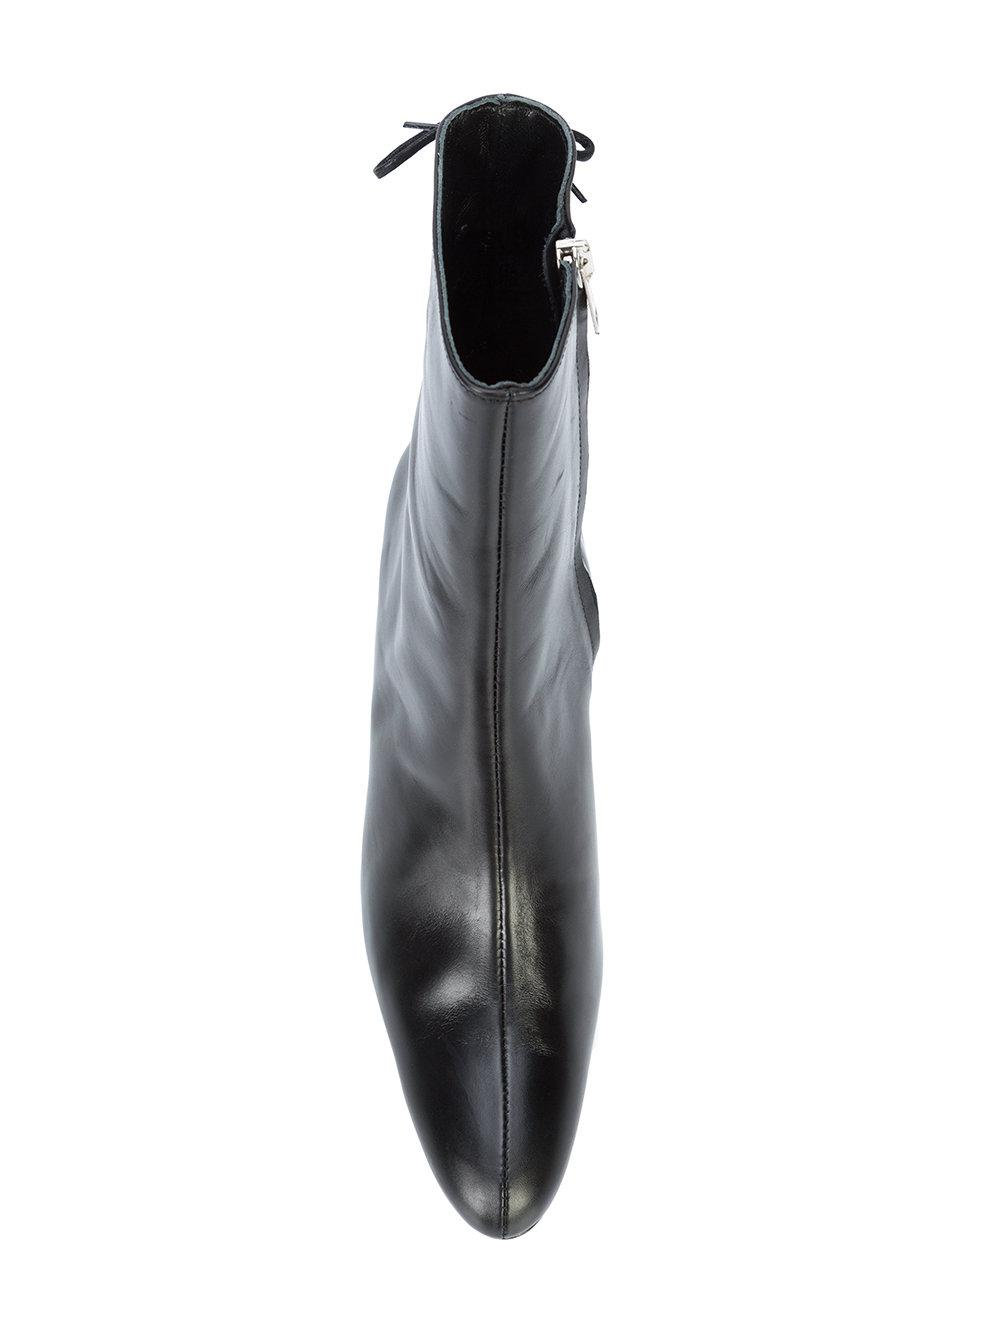 Dorateymur Leather Elephant Heel Boots in Black